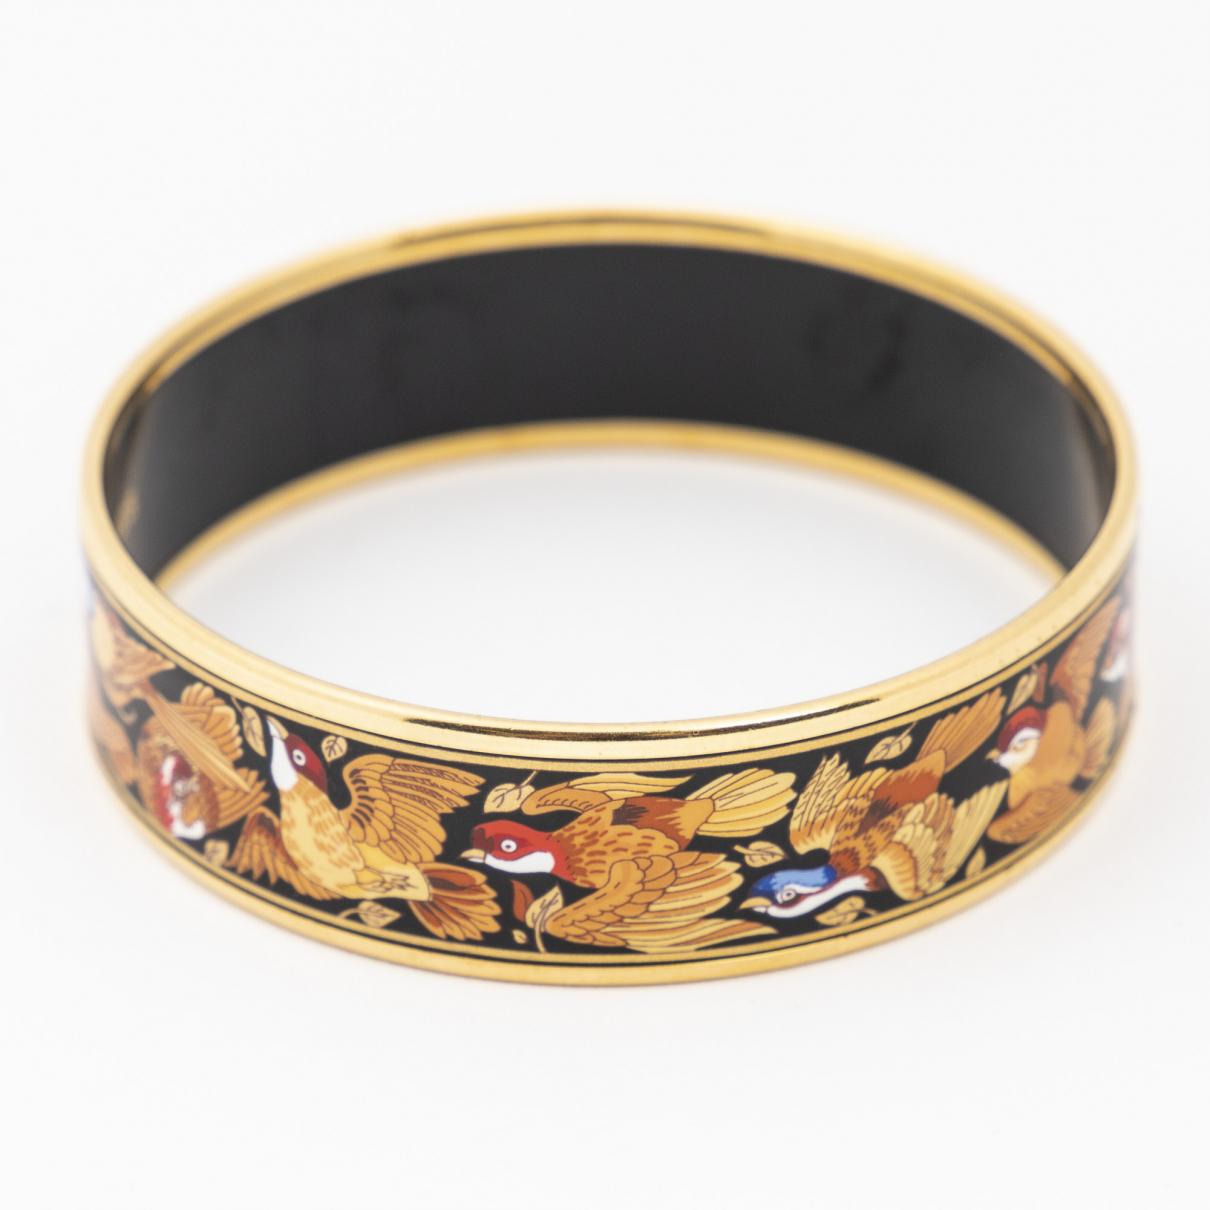 Hermès \N Black Yellow gold bracelet for Women \N